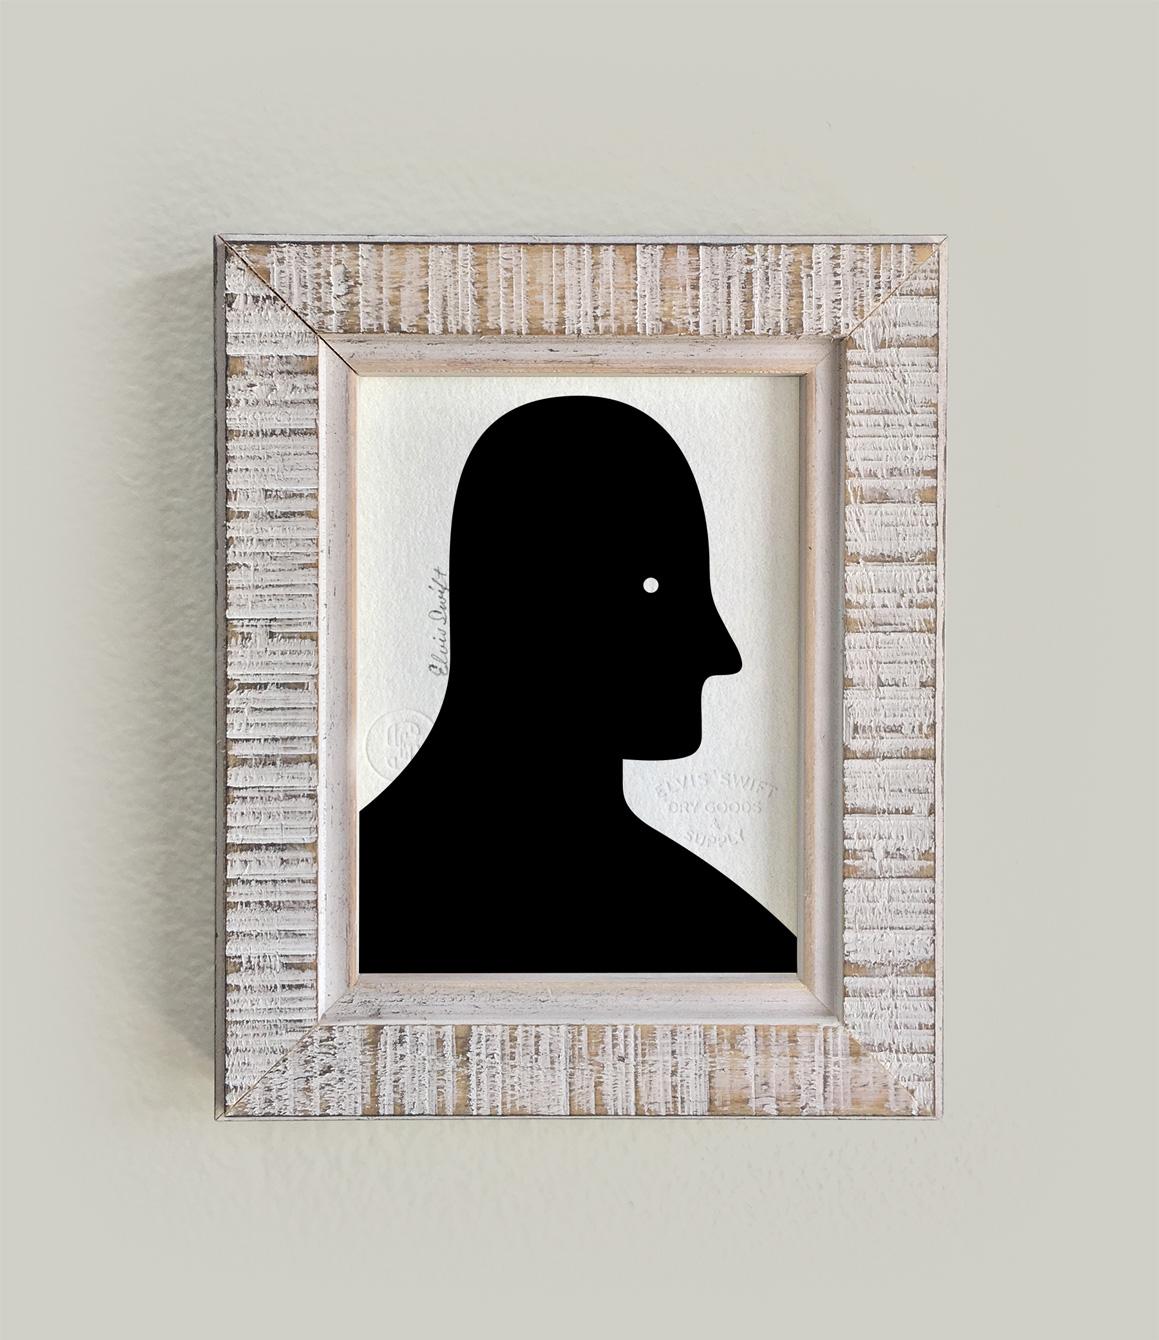 ESDGS_Framed_Roughly_Man